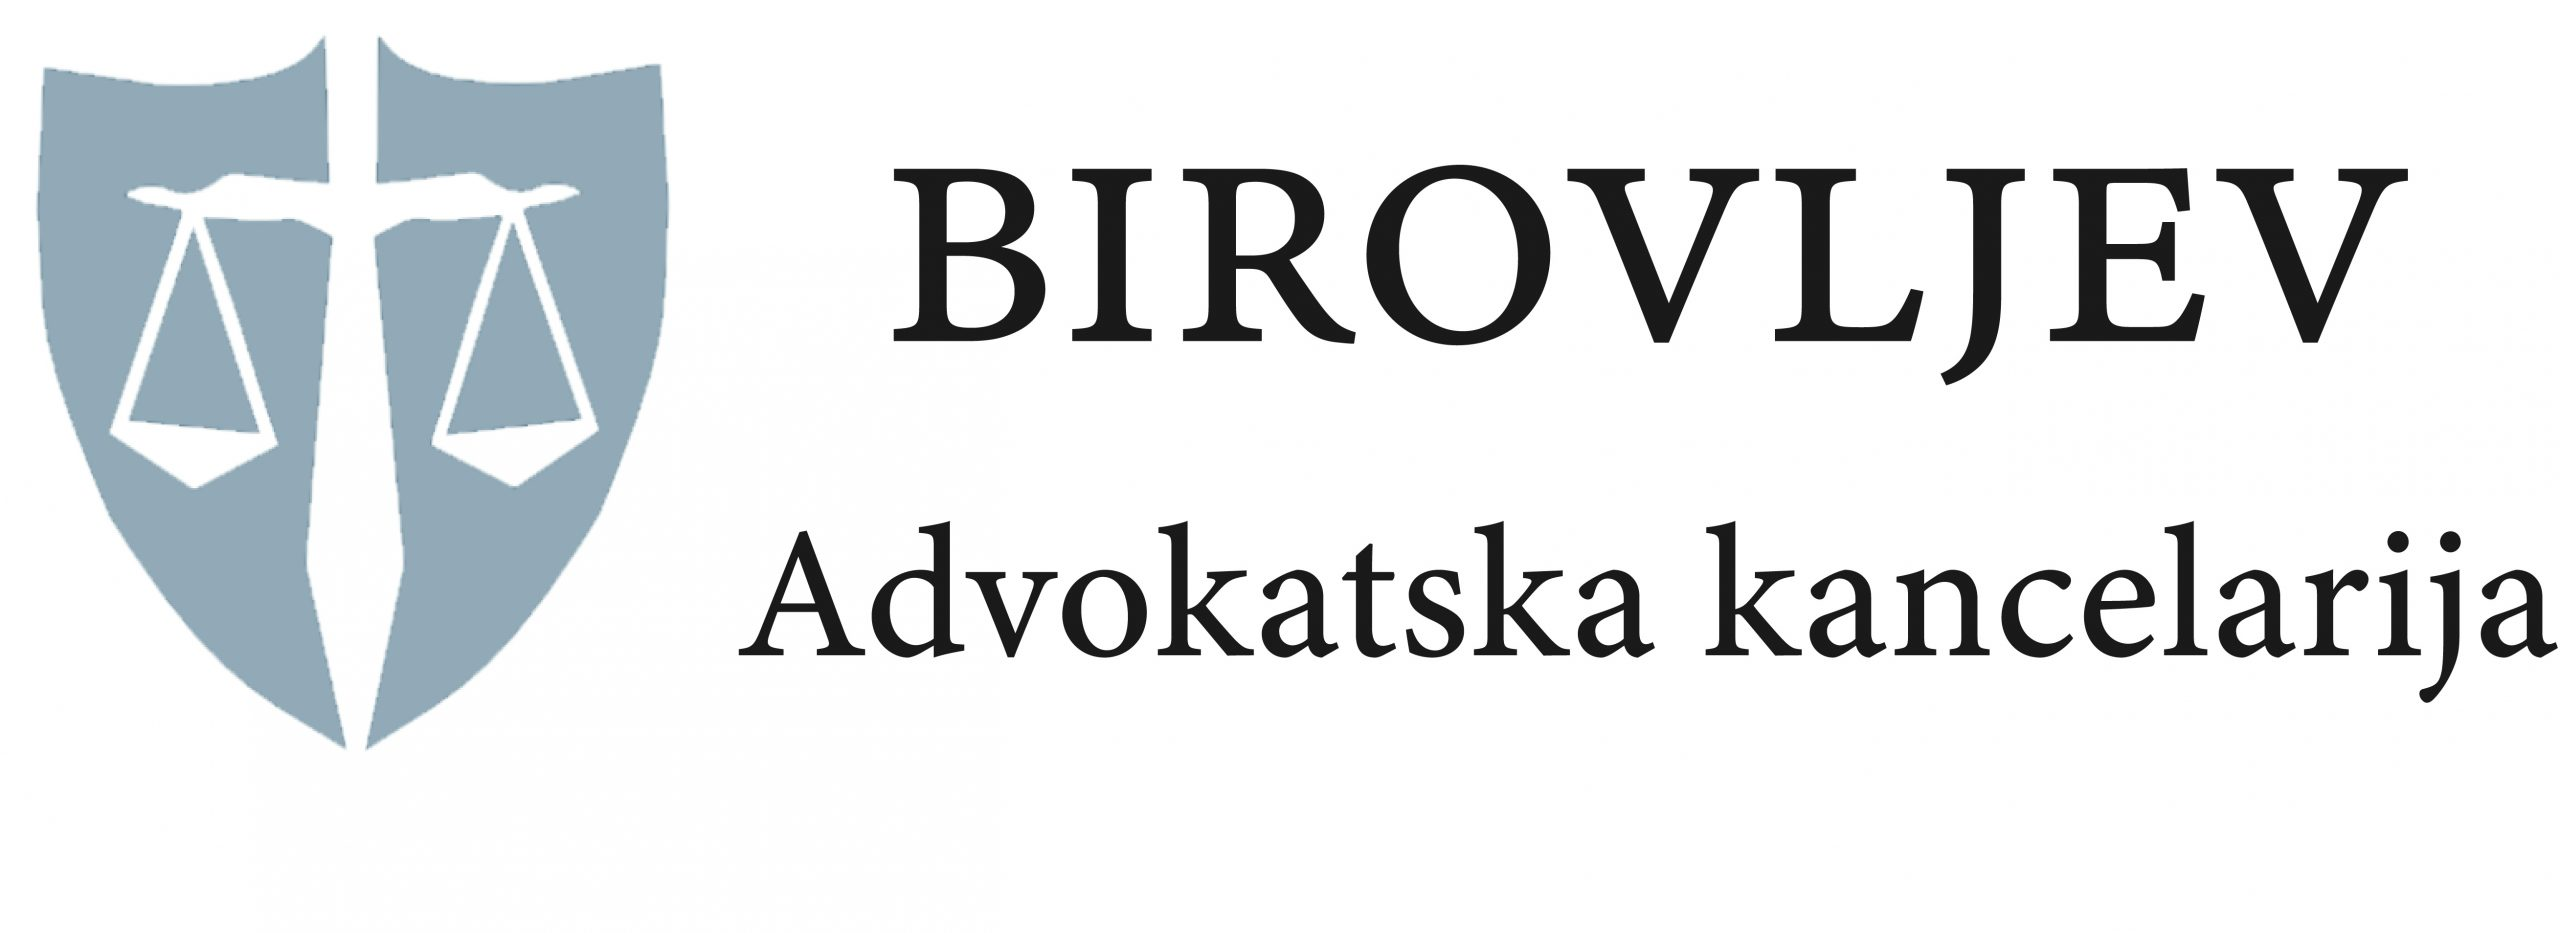 Advokatska kancelarija Birovljev S. Marko